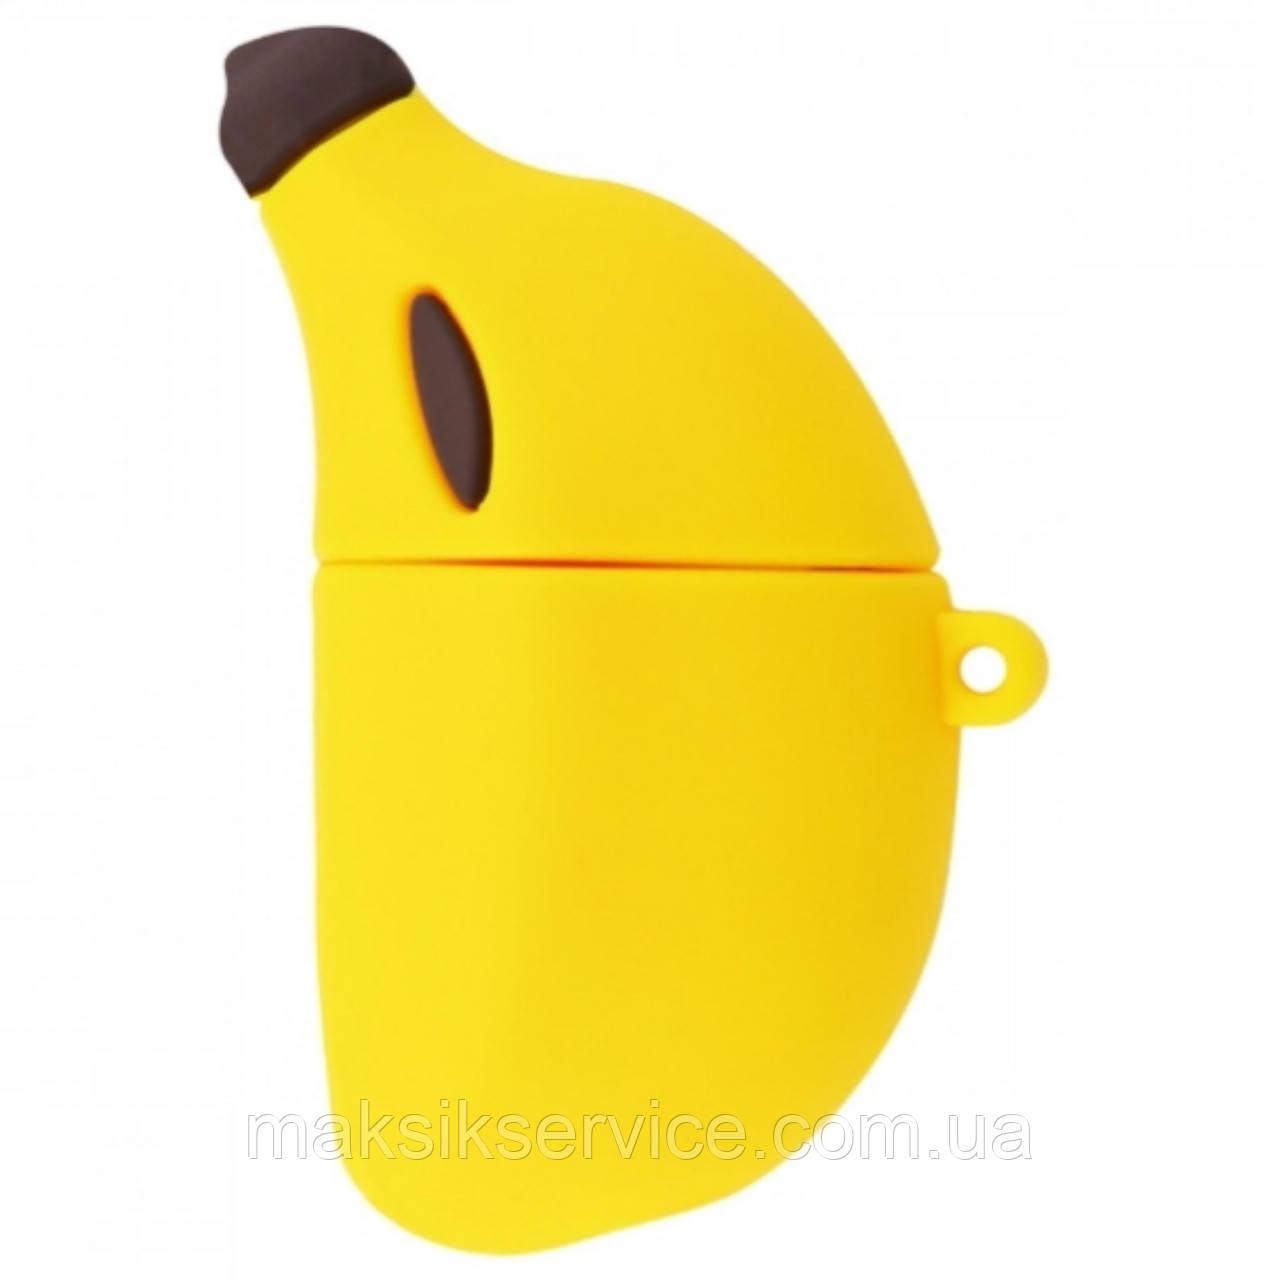 Чехол для AirPods 1/2 Banana